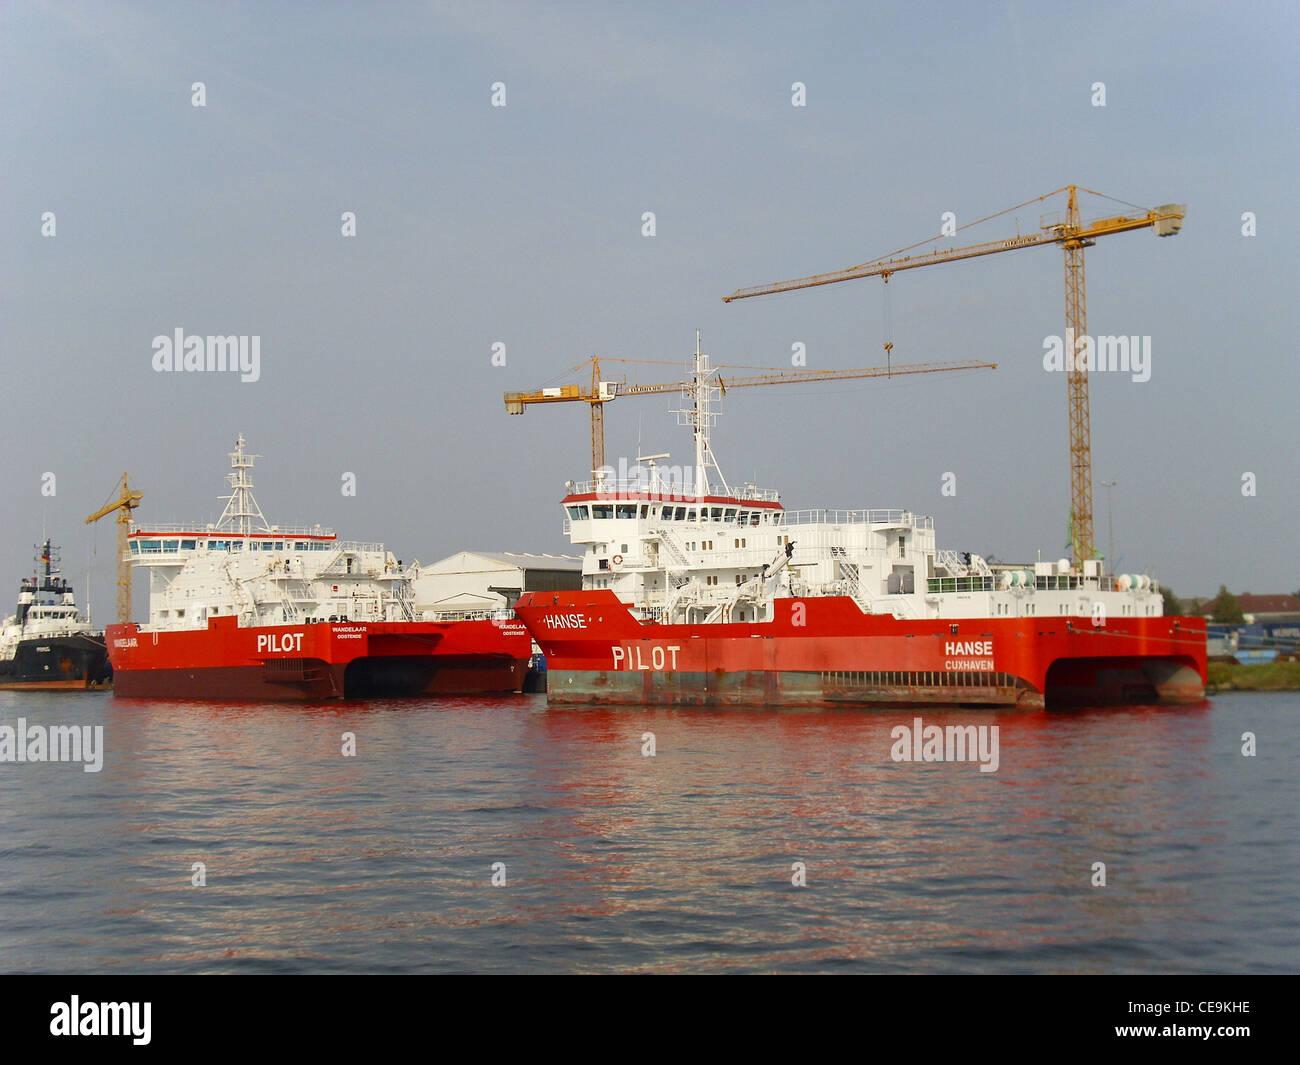 pilot vessels Hanse and Wandelaar - Stock Image